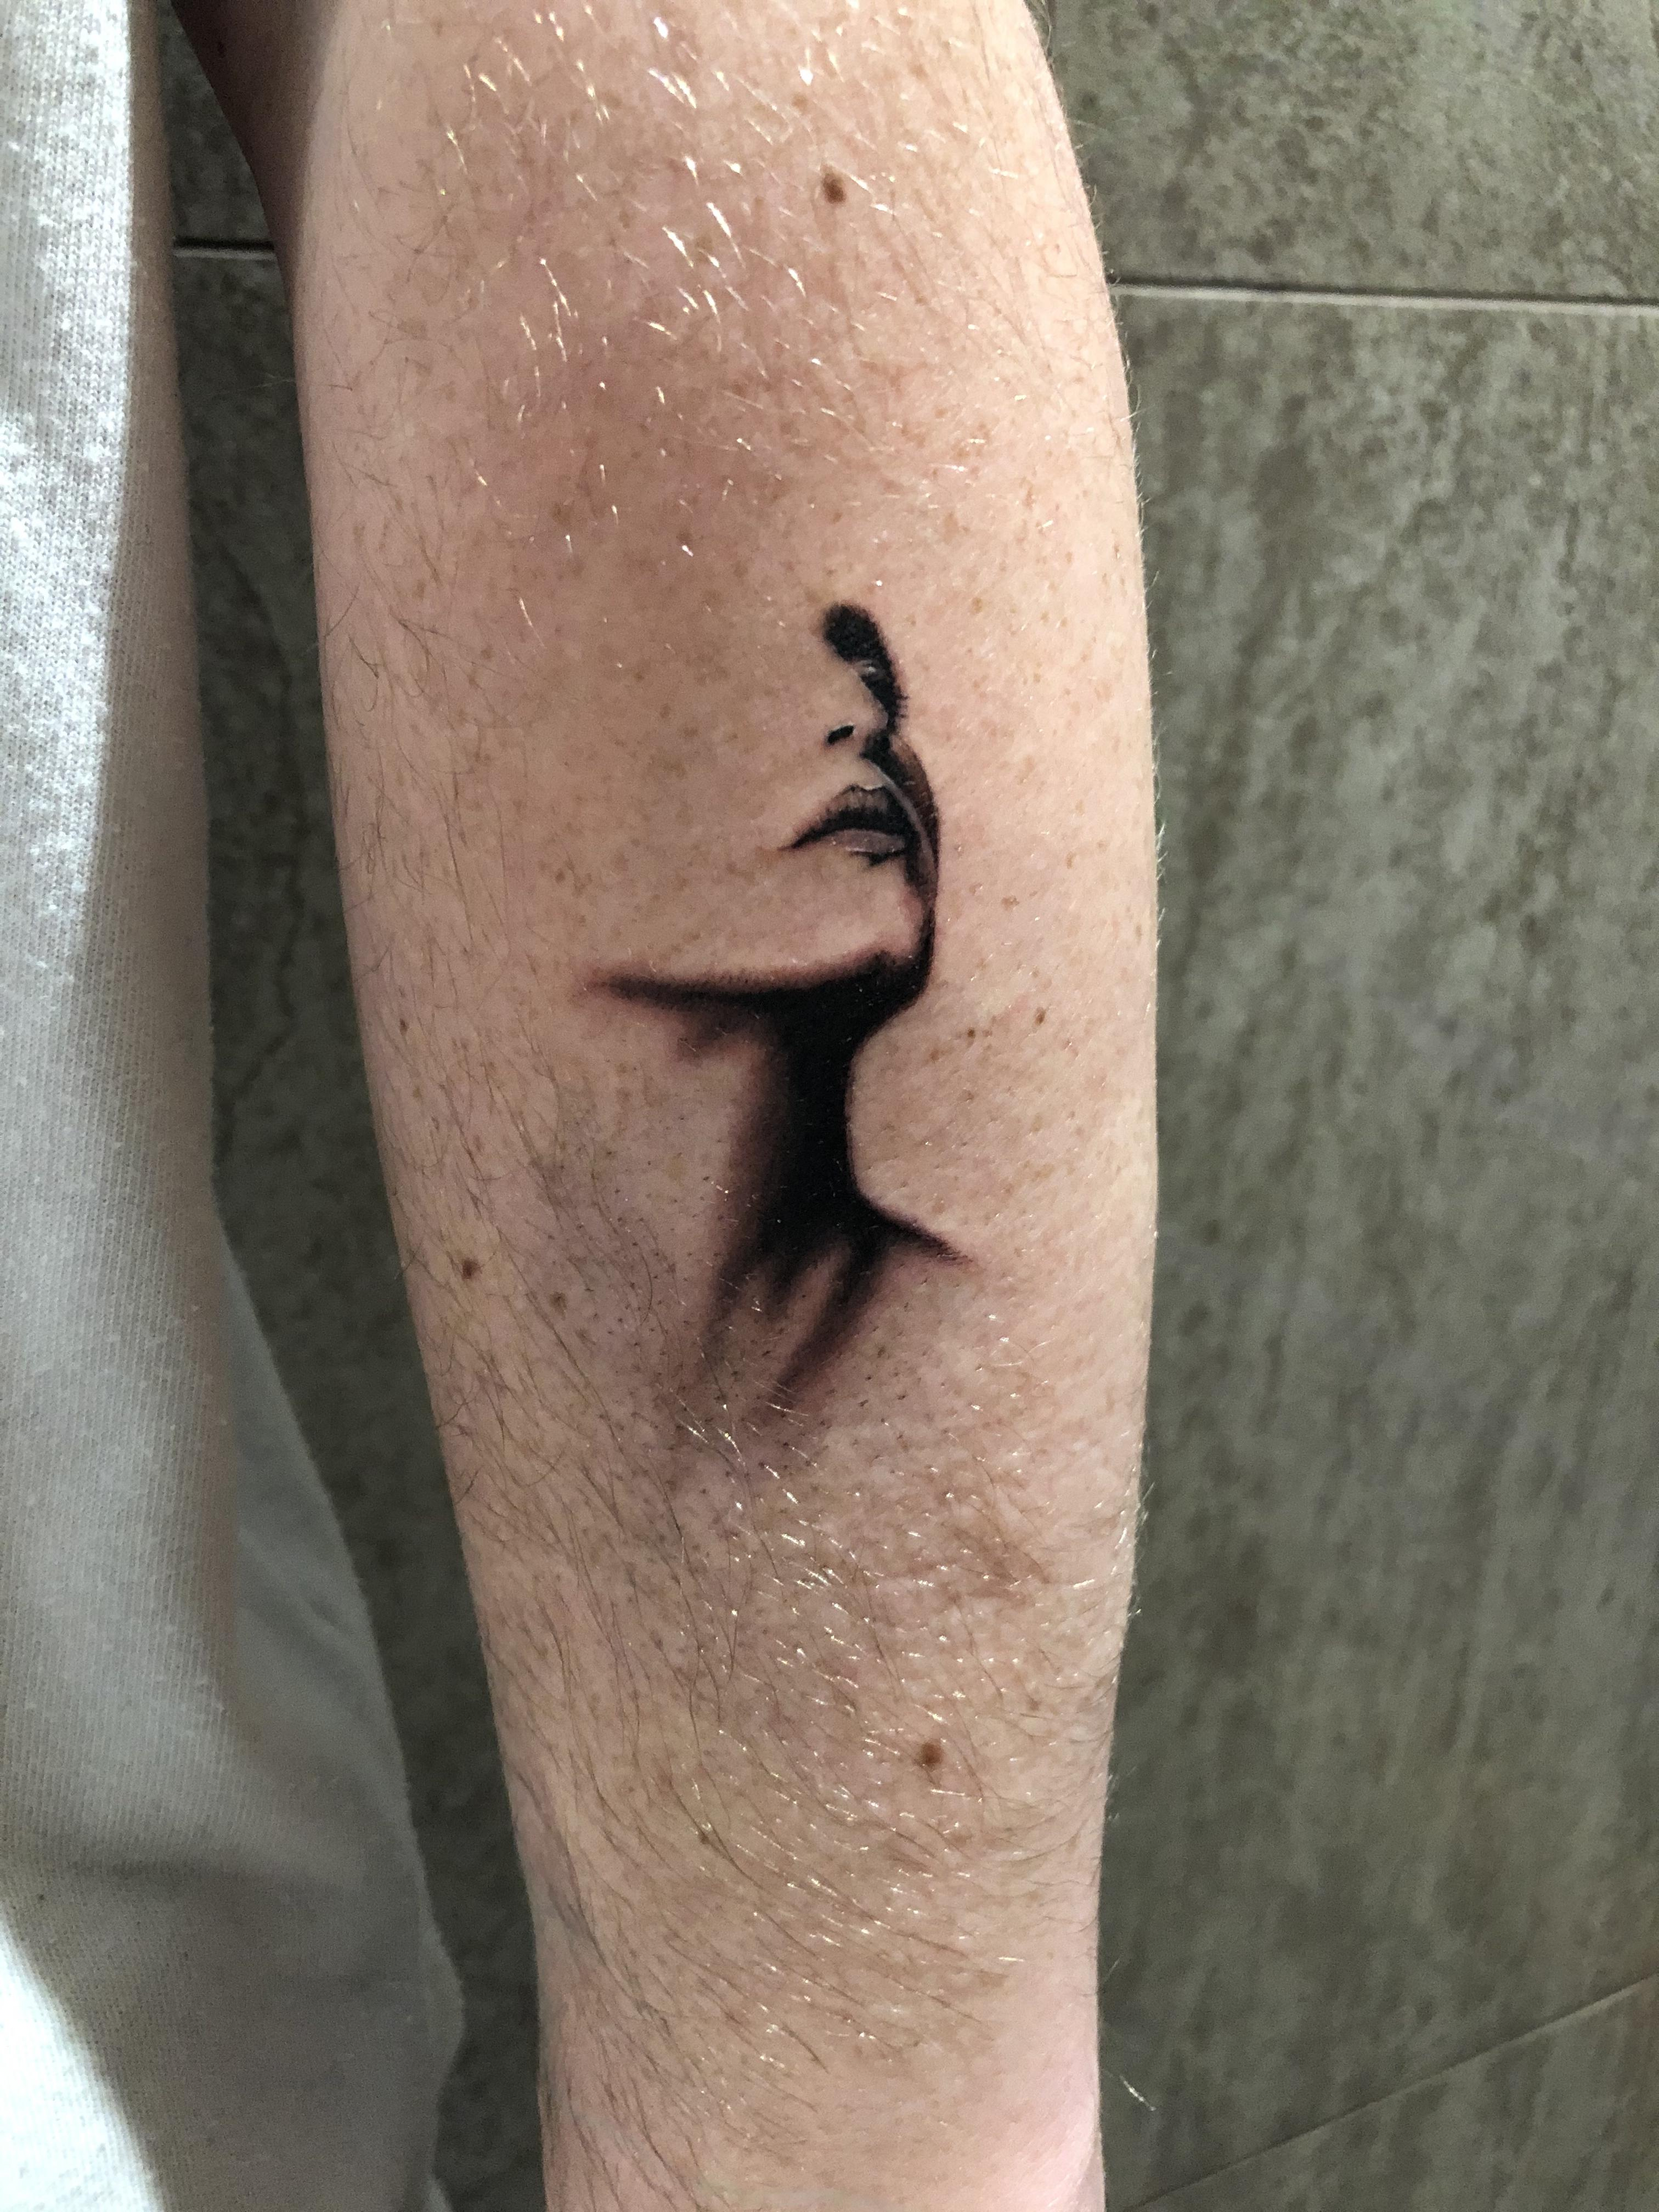 Negative Space Tattoos : negative, space, tattoos, Negative, Space, Nathan, Hill,, Welwyn, Garden, City,, Tattoos